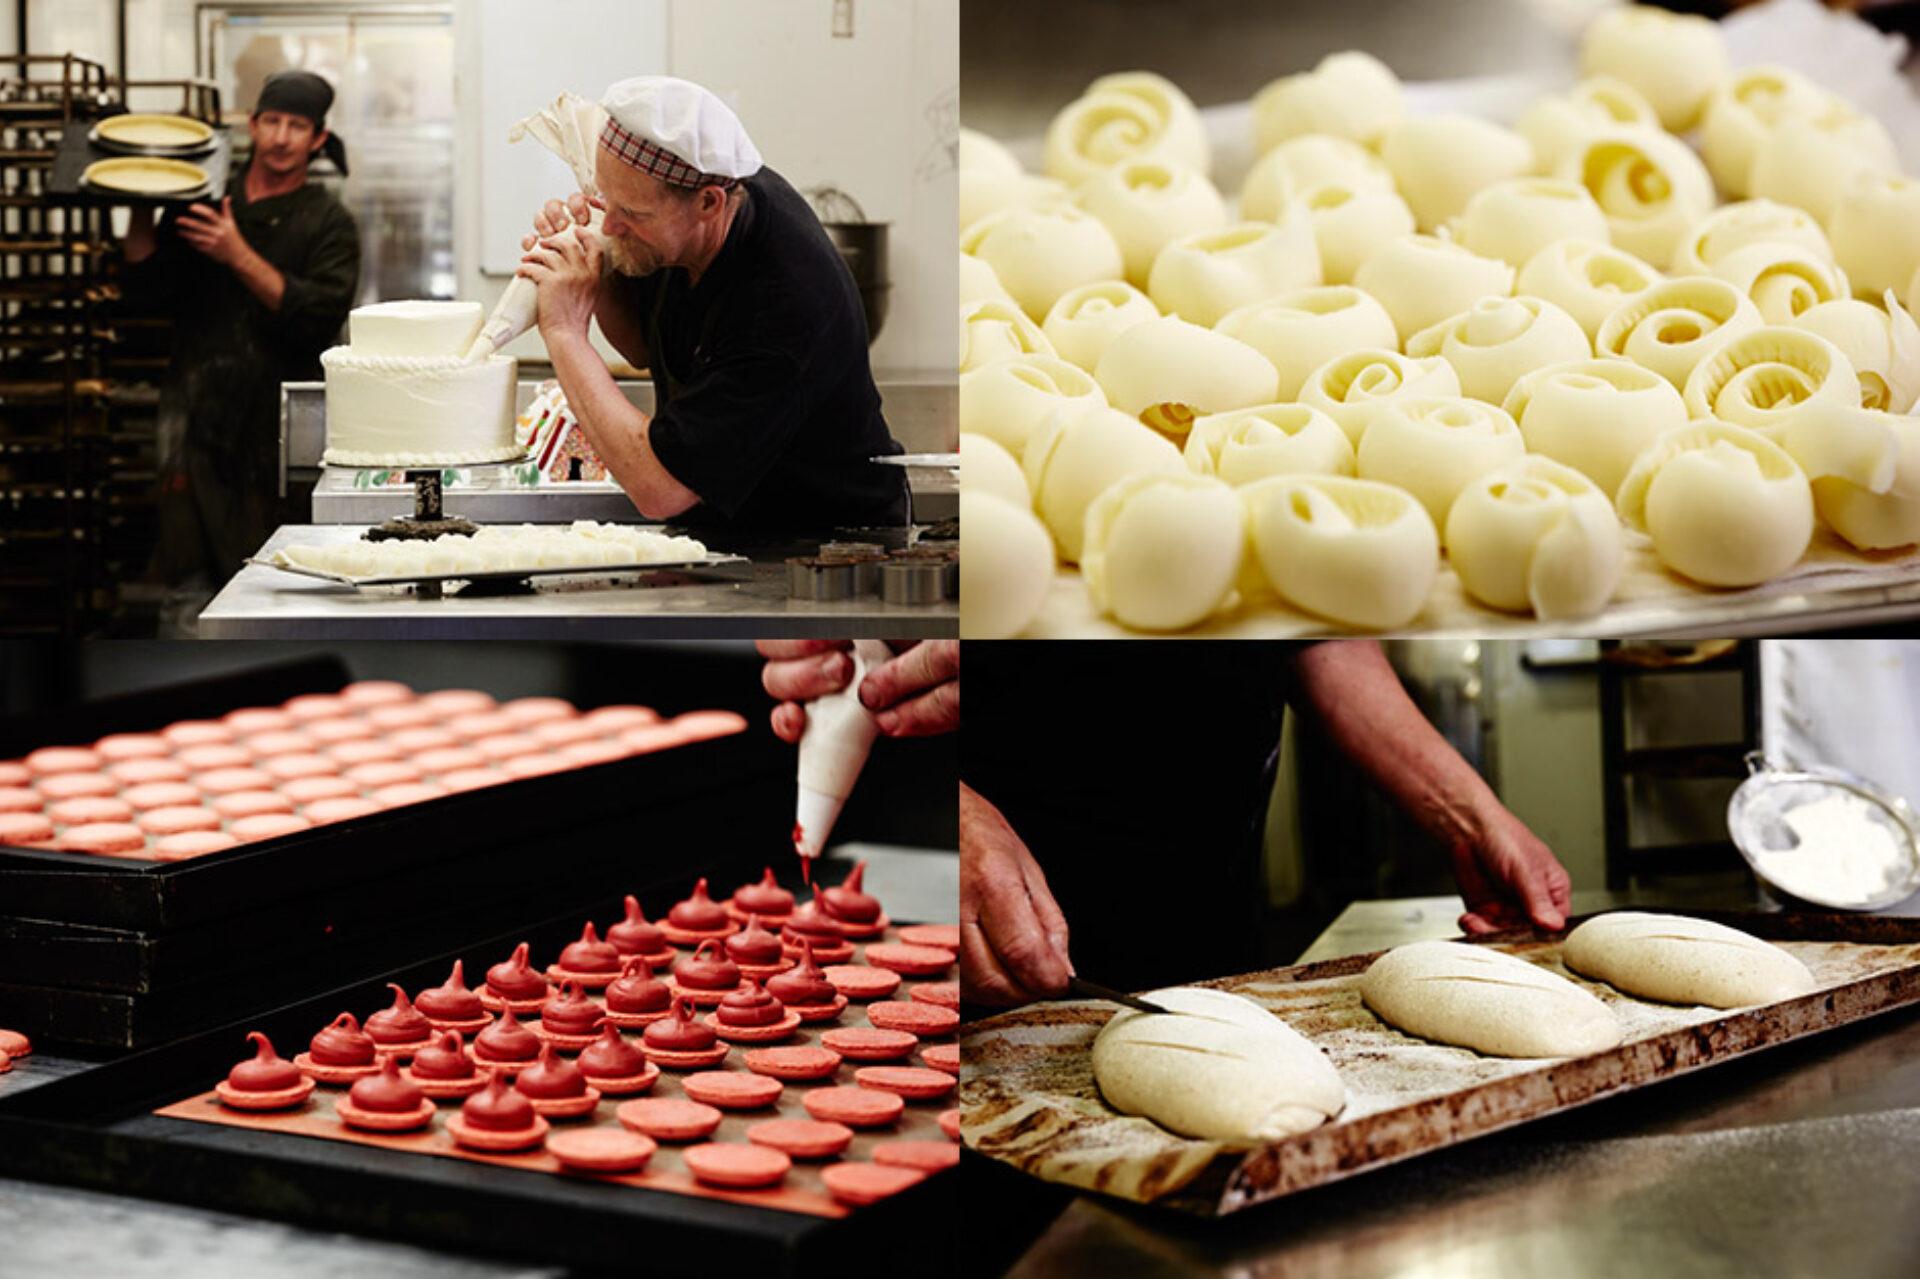 Snows artisan bakers 13